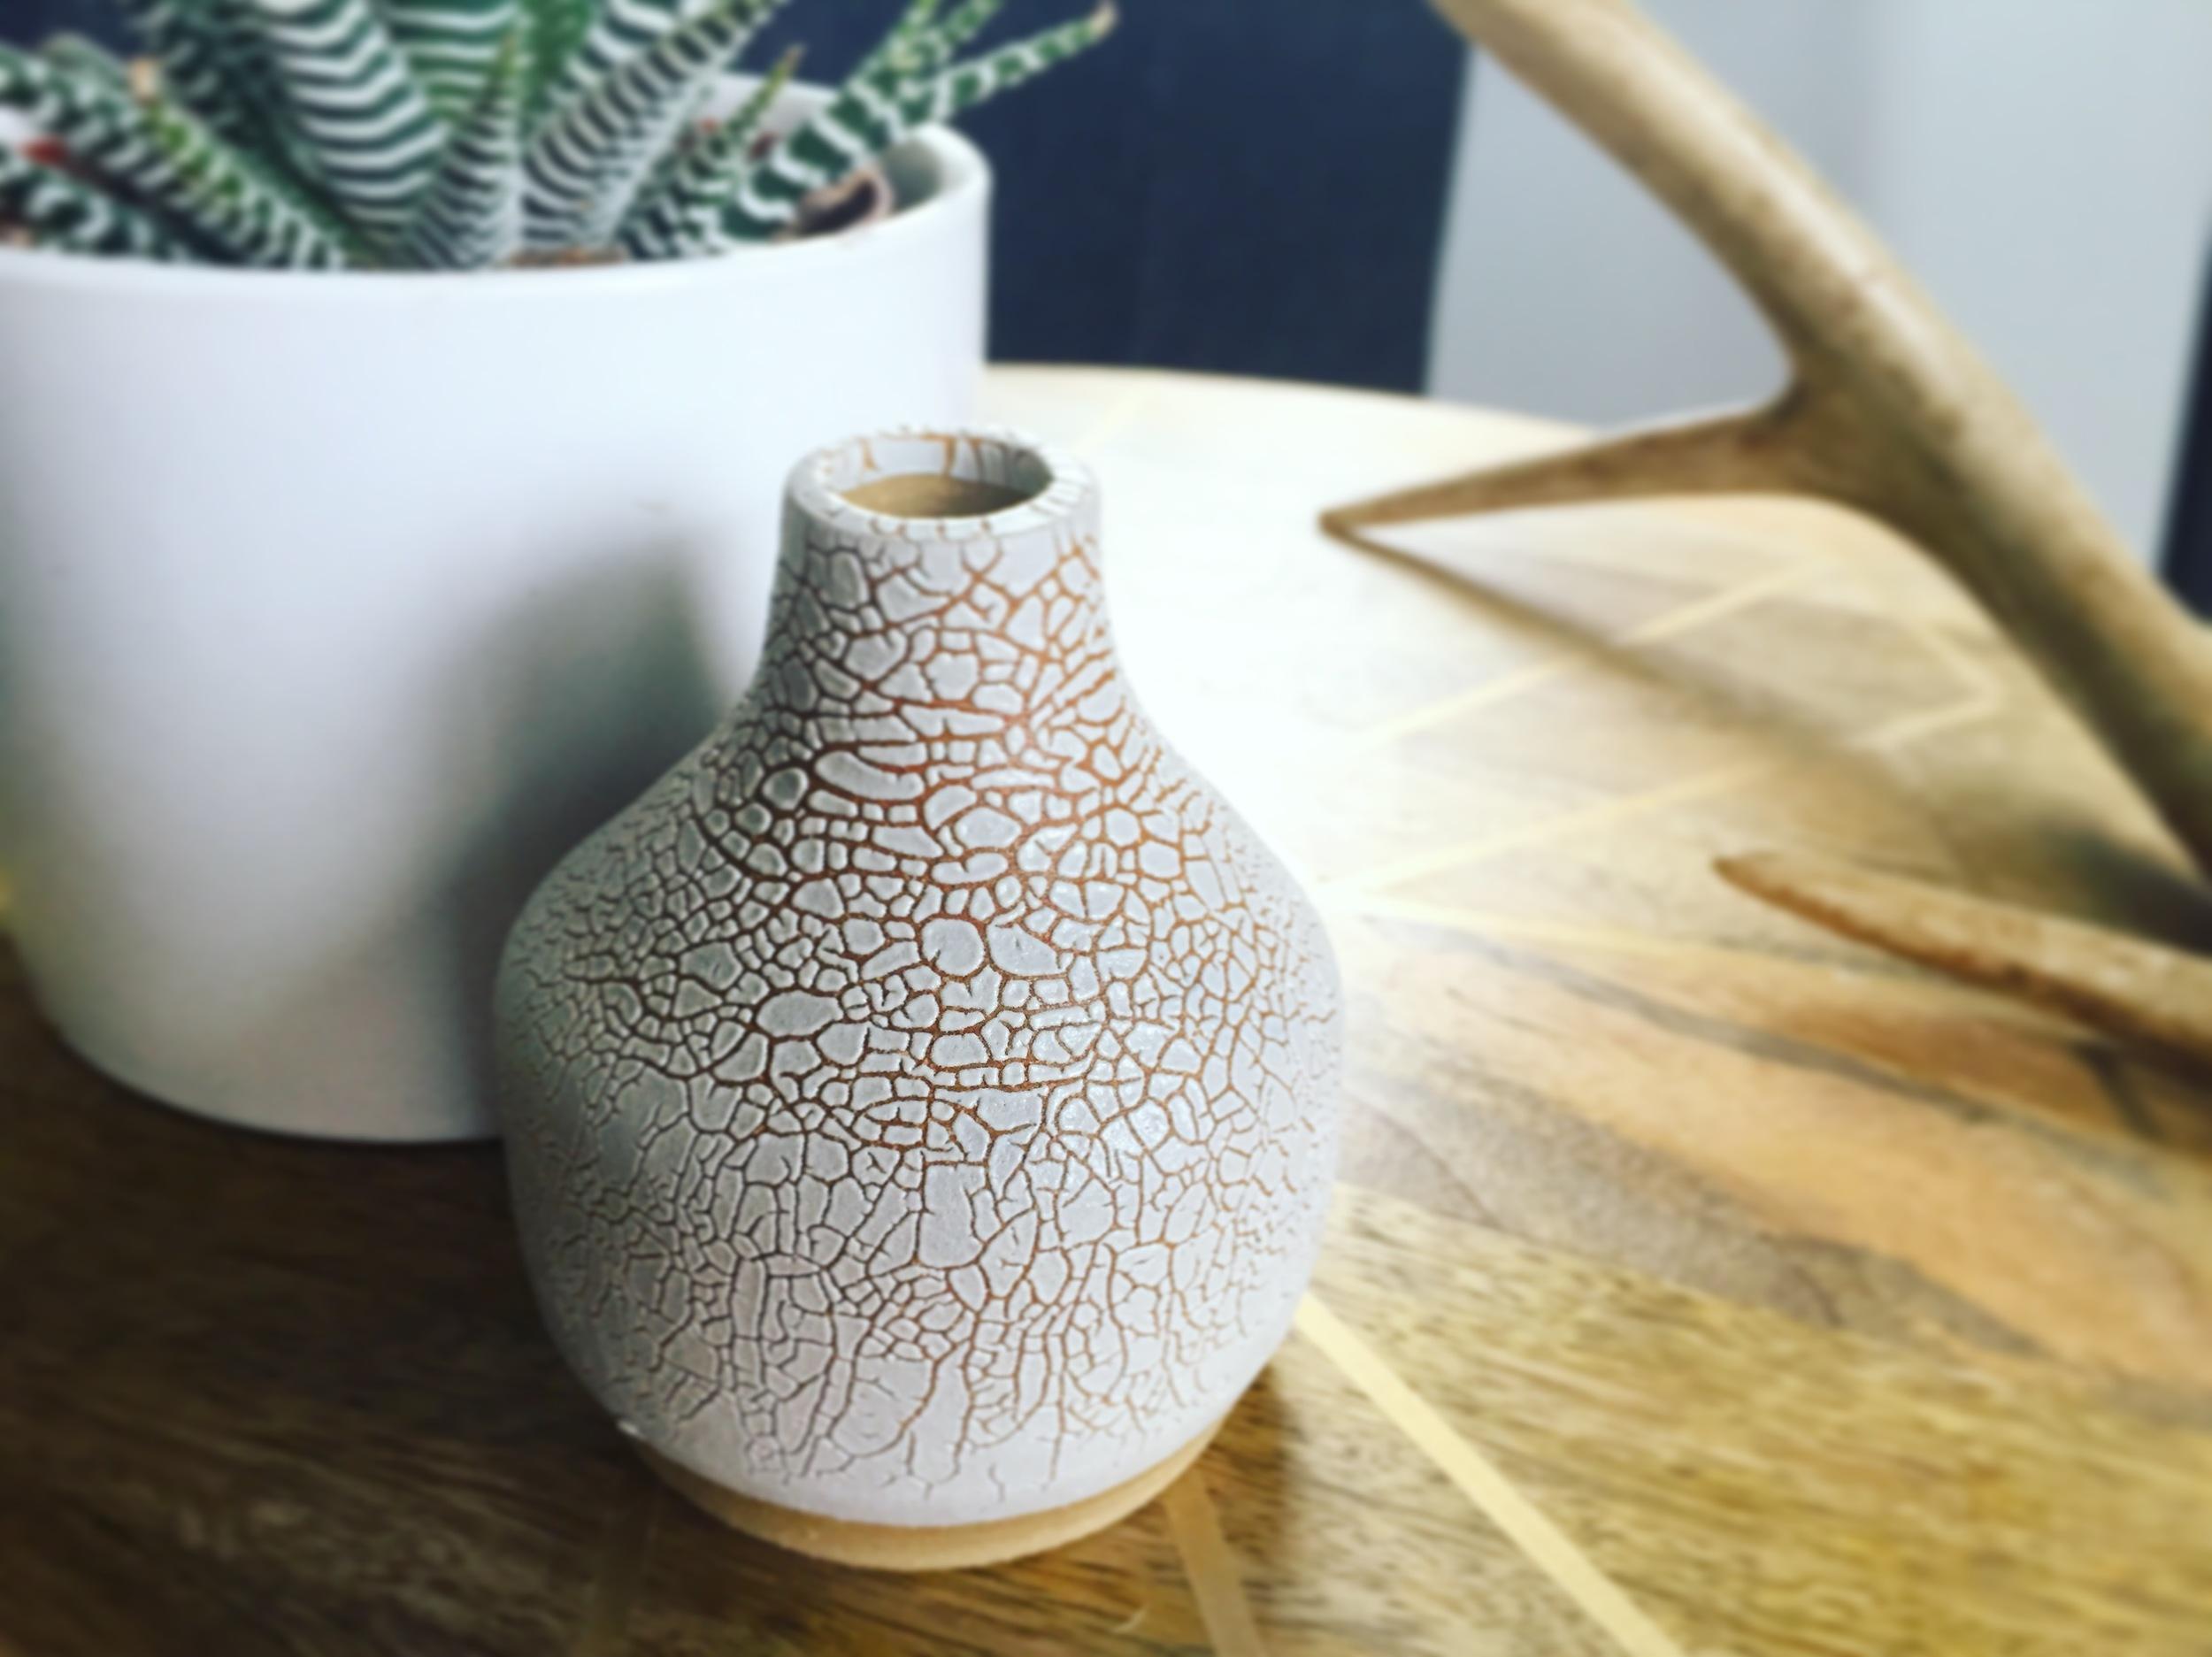 Beautiful pottery I found at a flea market in NOLA